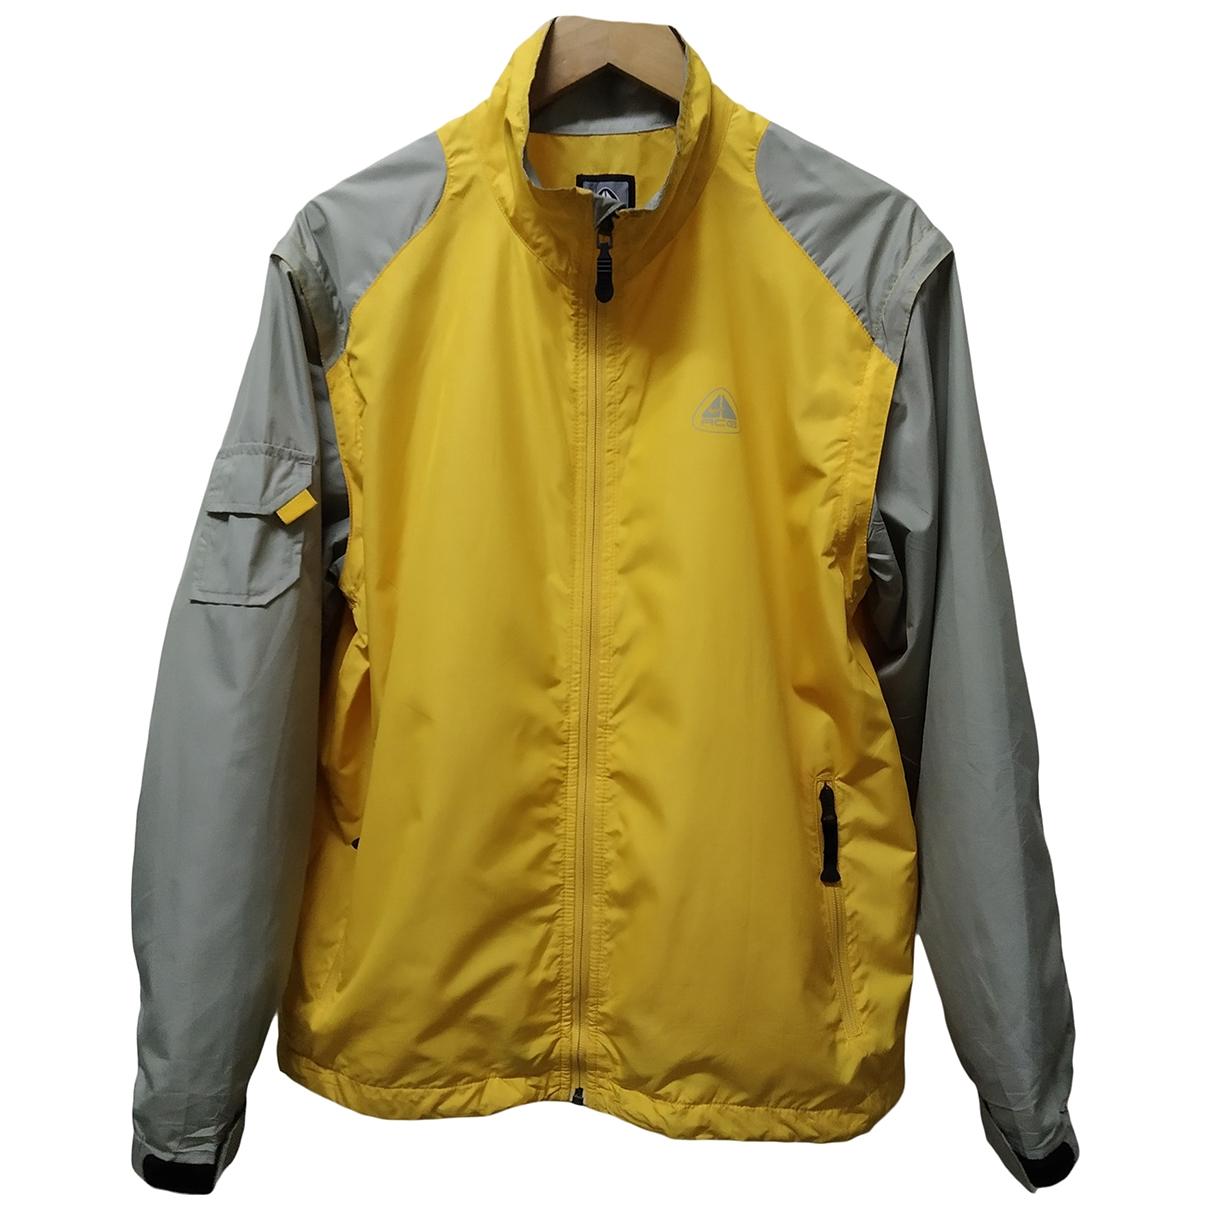 Nike Acg \N Yellow jacket  for Men L International